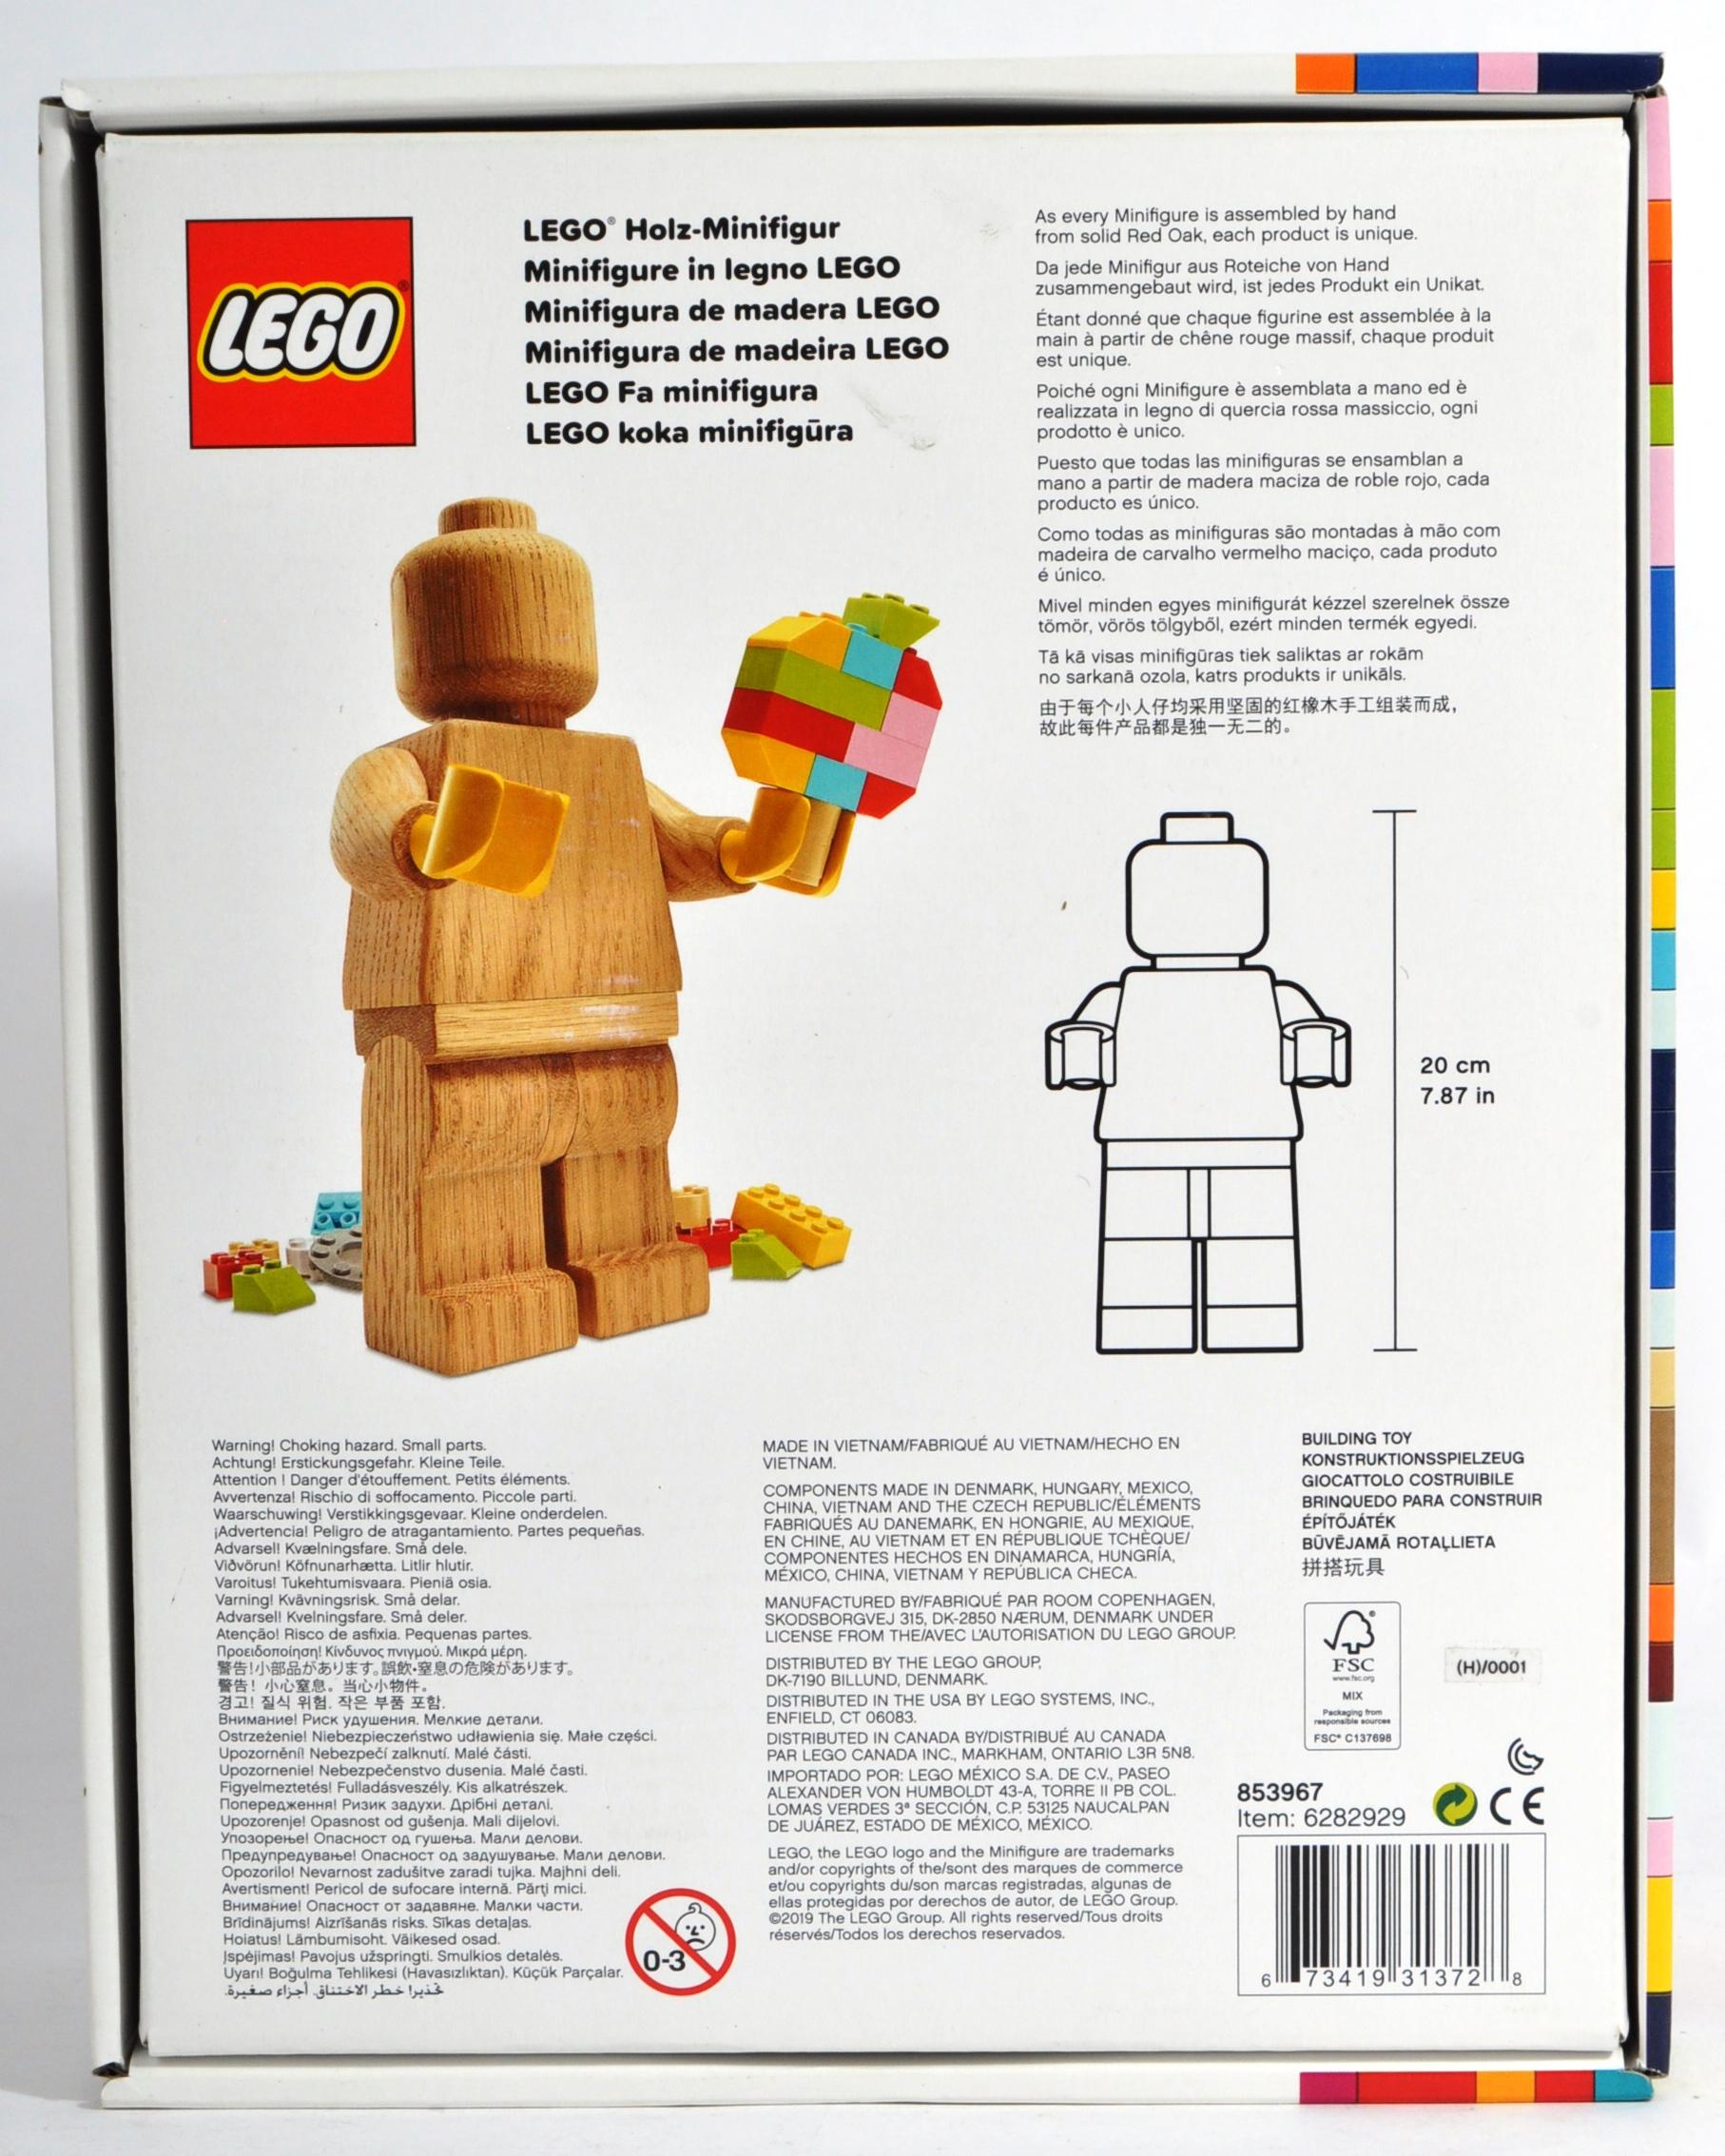 LEGO ORIGINALS - 853967 - WOODEN MINIFIGURE - Image 4 of 5